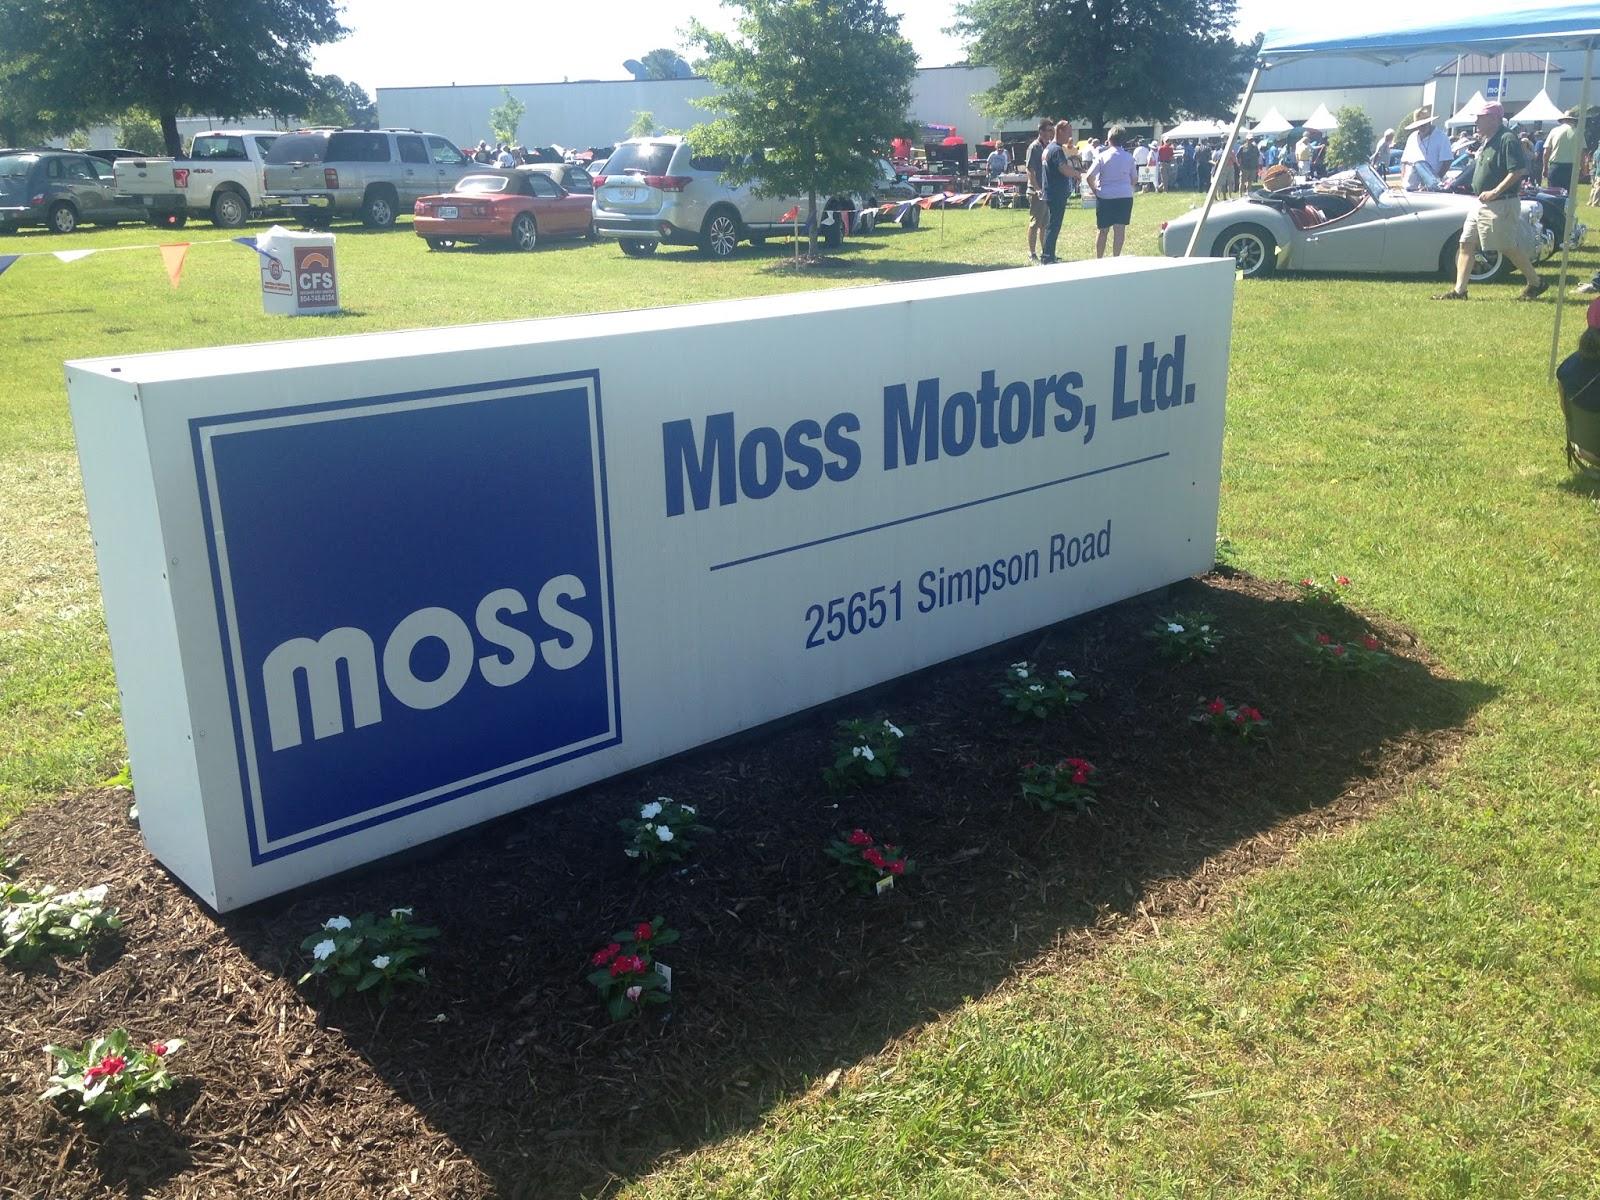 Nixon Motor Sports Moss Motors Motorfest Part I